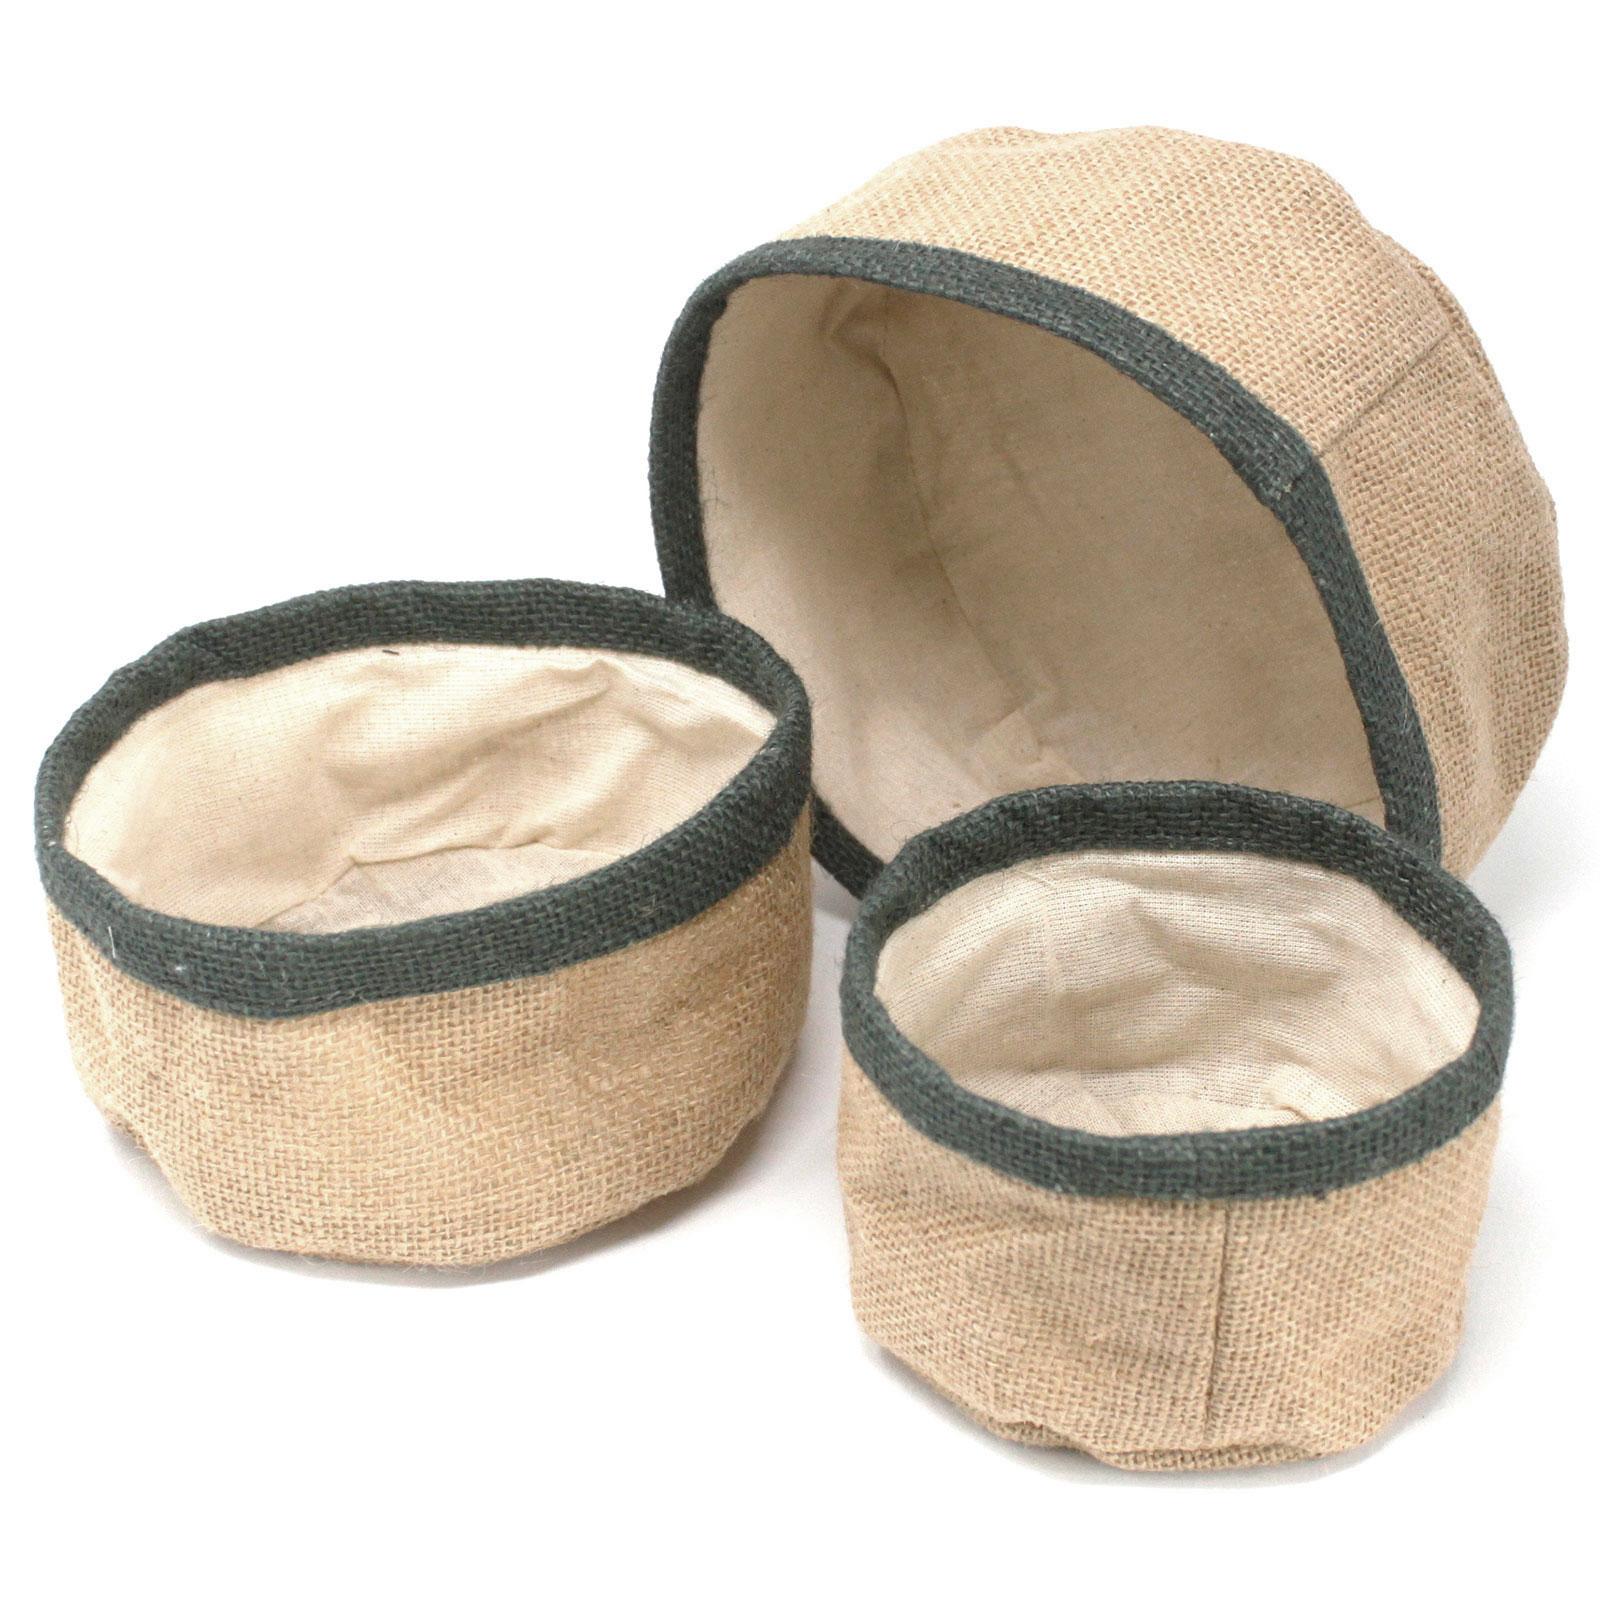 Set of 3 Natural Jute Baskets Charcoal